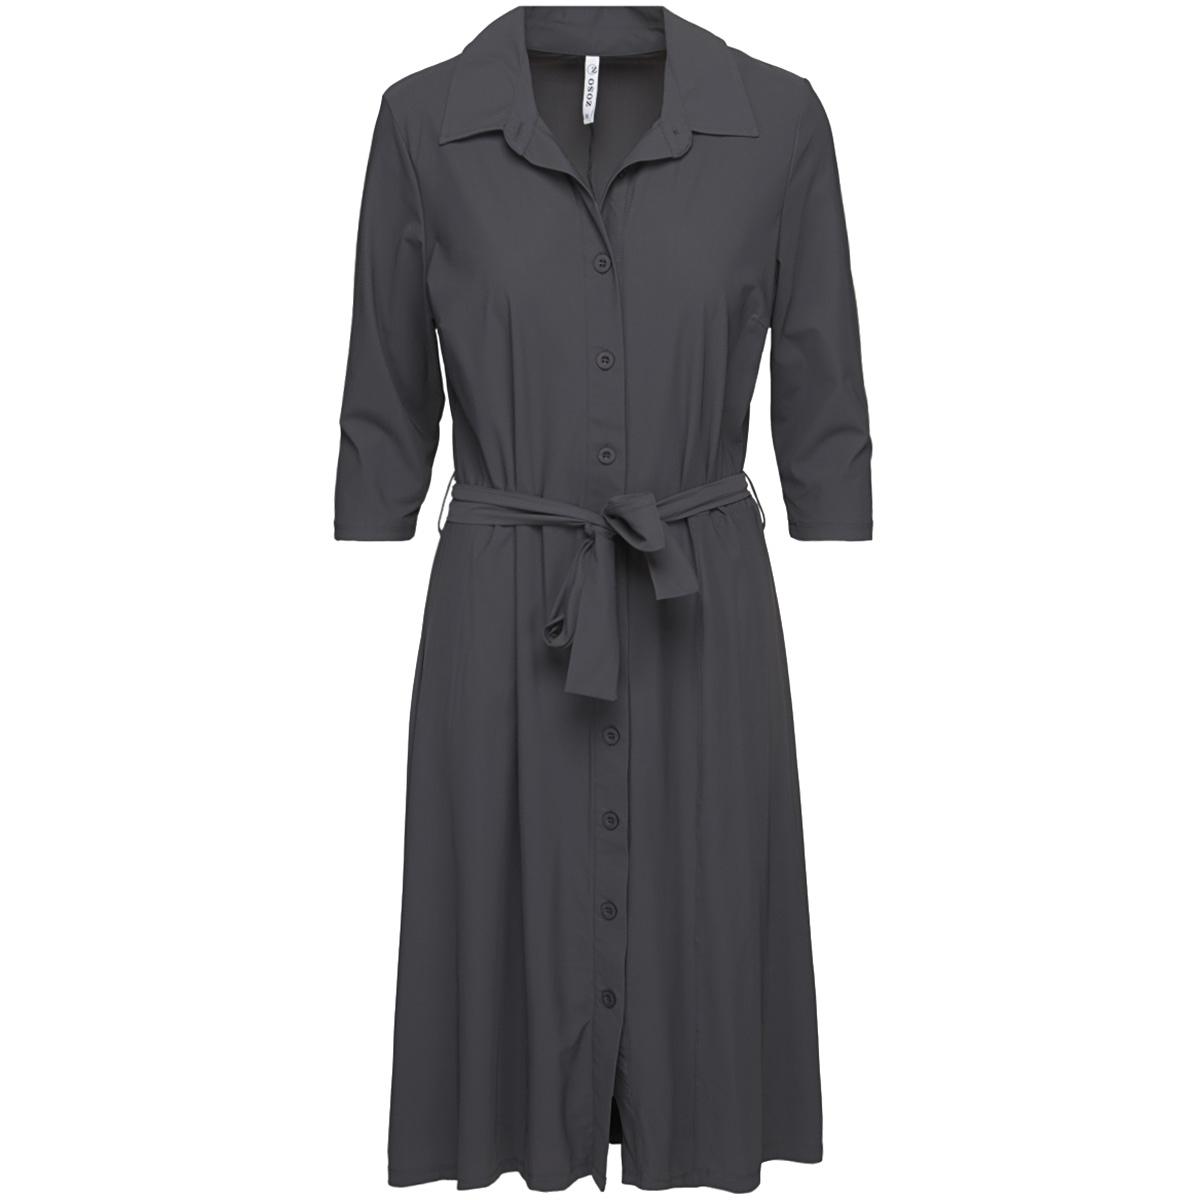 romance travel dress 201 zoso jurk 0059 charcoal